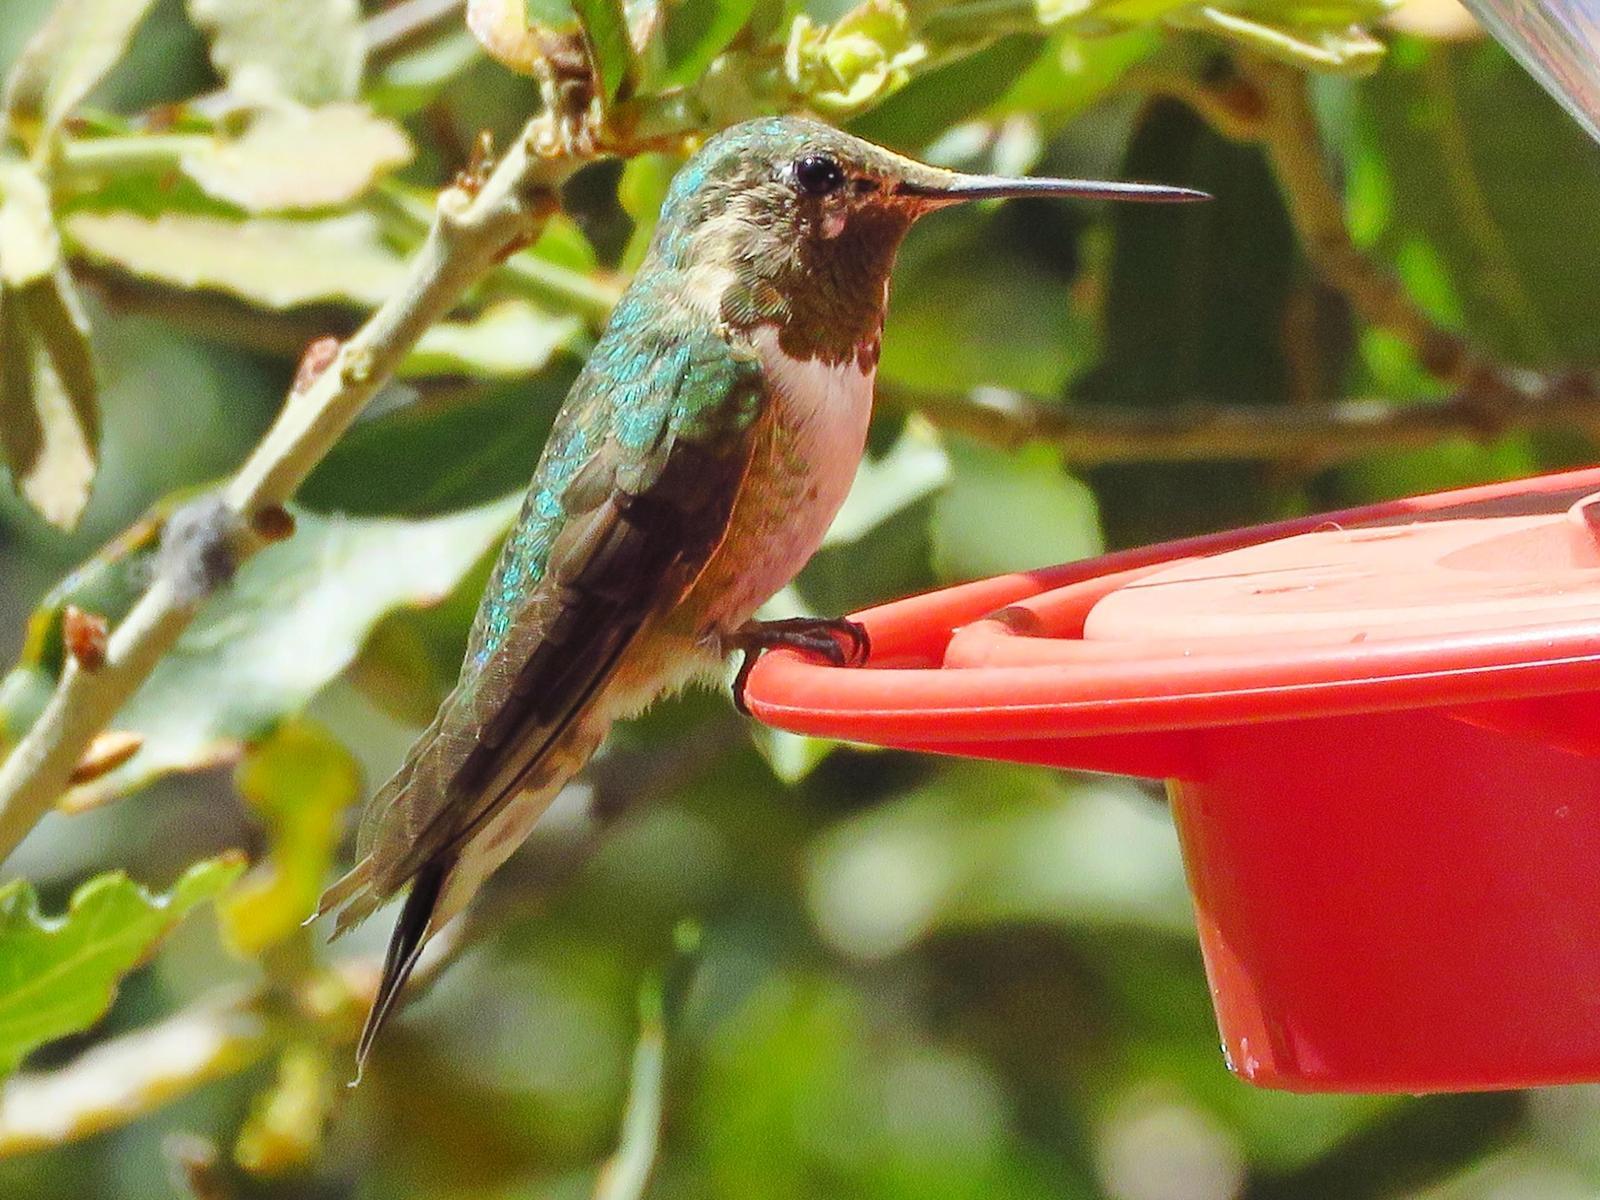 Broad-tailed Hummingbird Photo by Bob Neugebauer